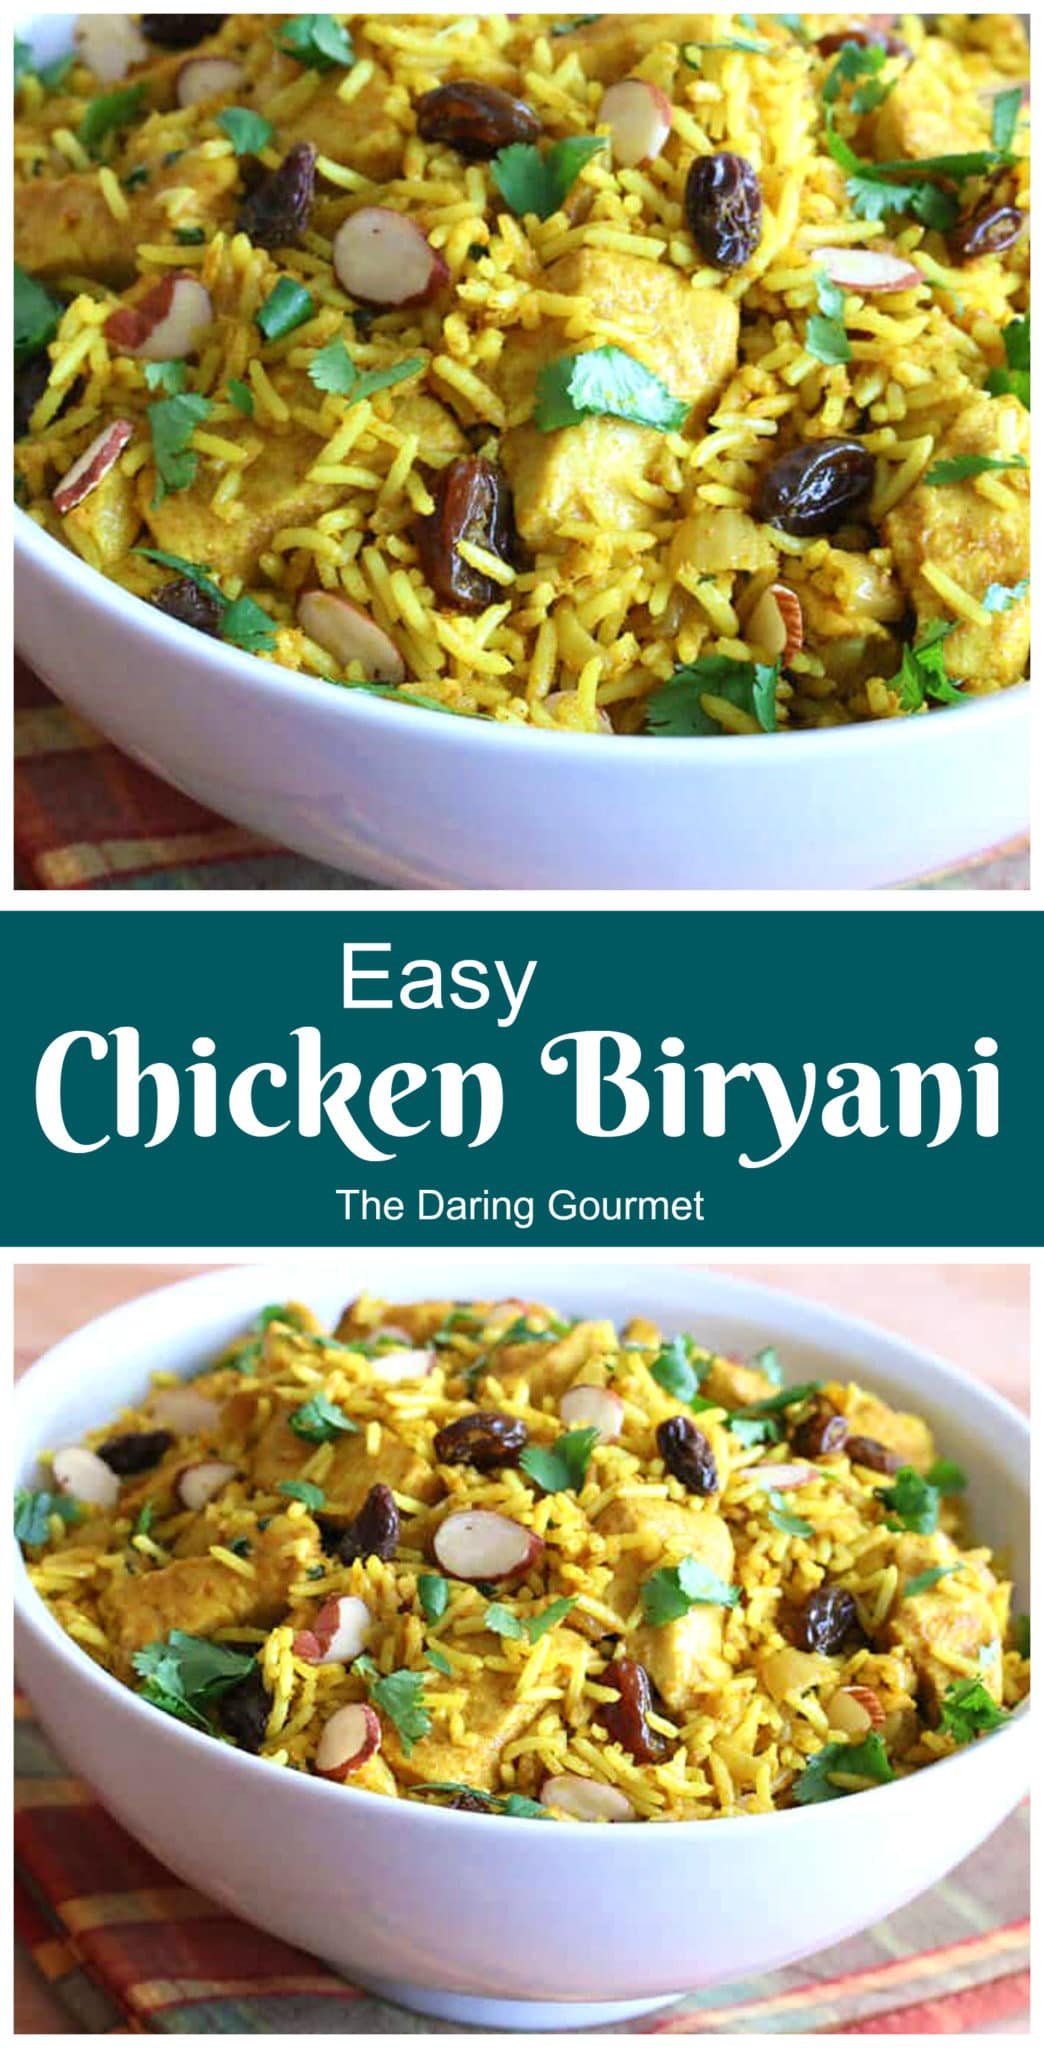 chicken biryani recipe easy fast Indian basmati rice curry raisins almonds